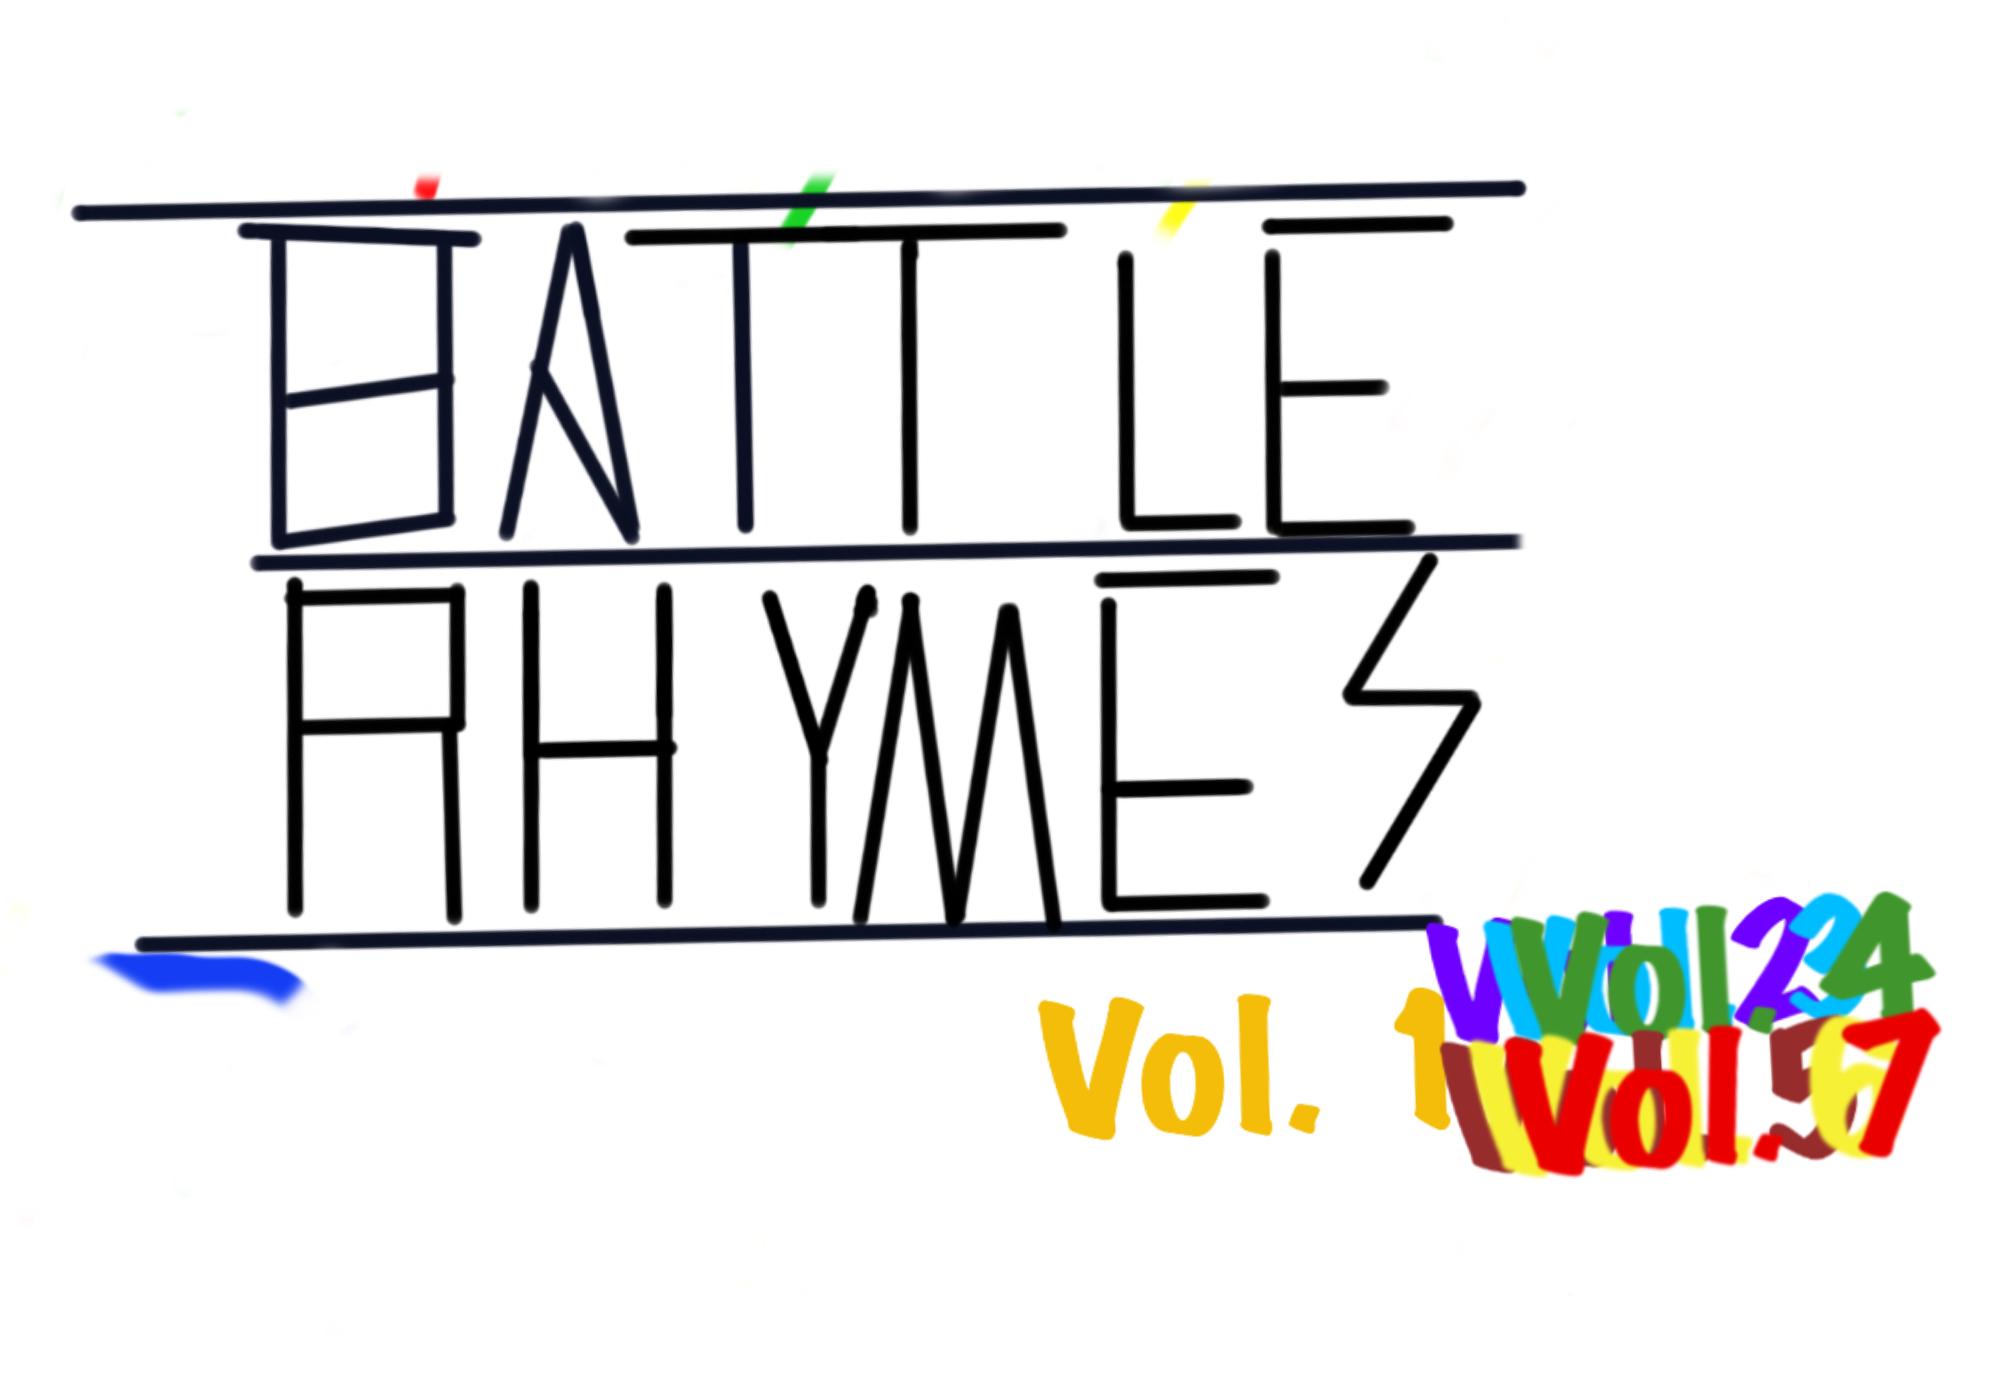 BattleRhymes Vols. 1 - 7 The complete set - Ultimate.